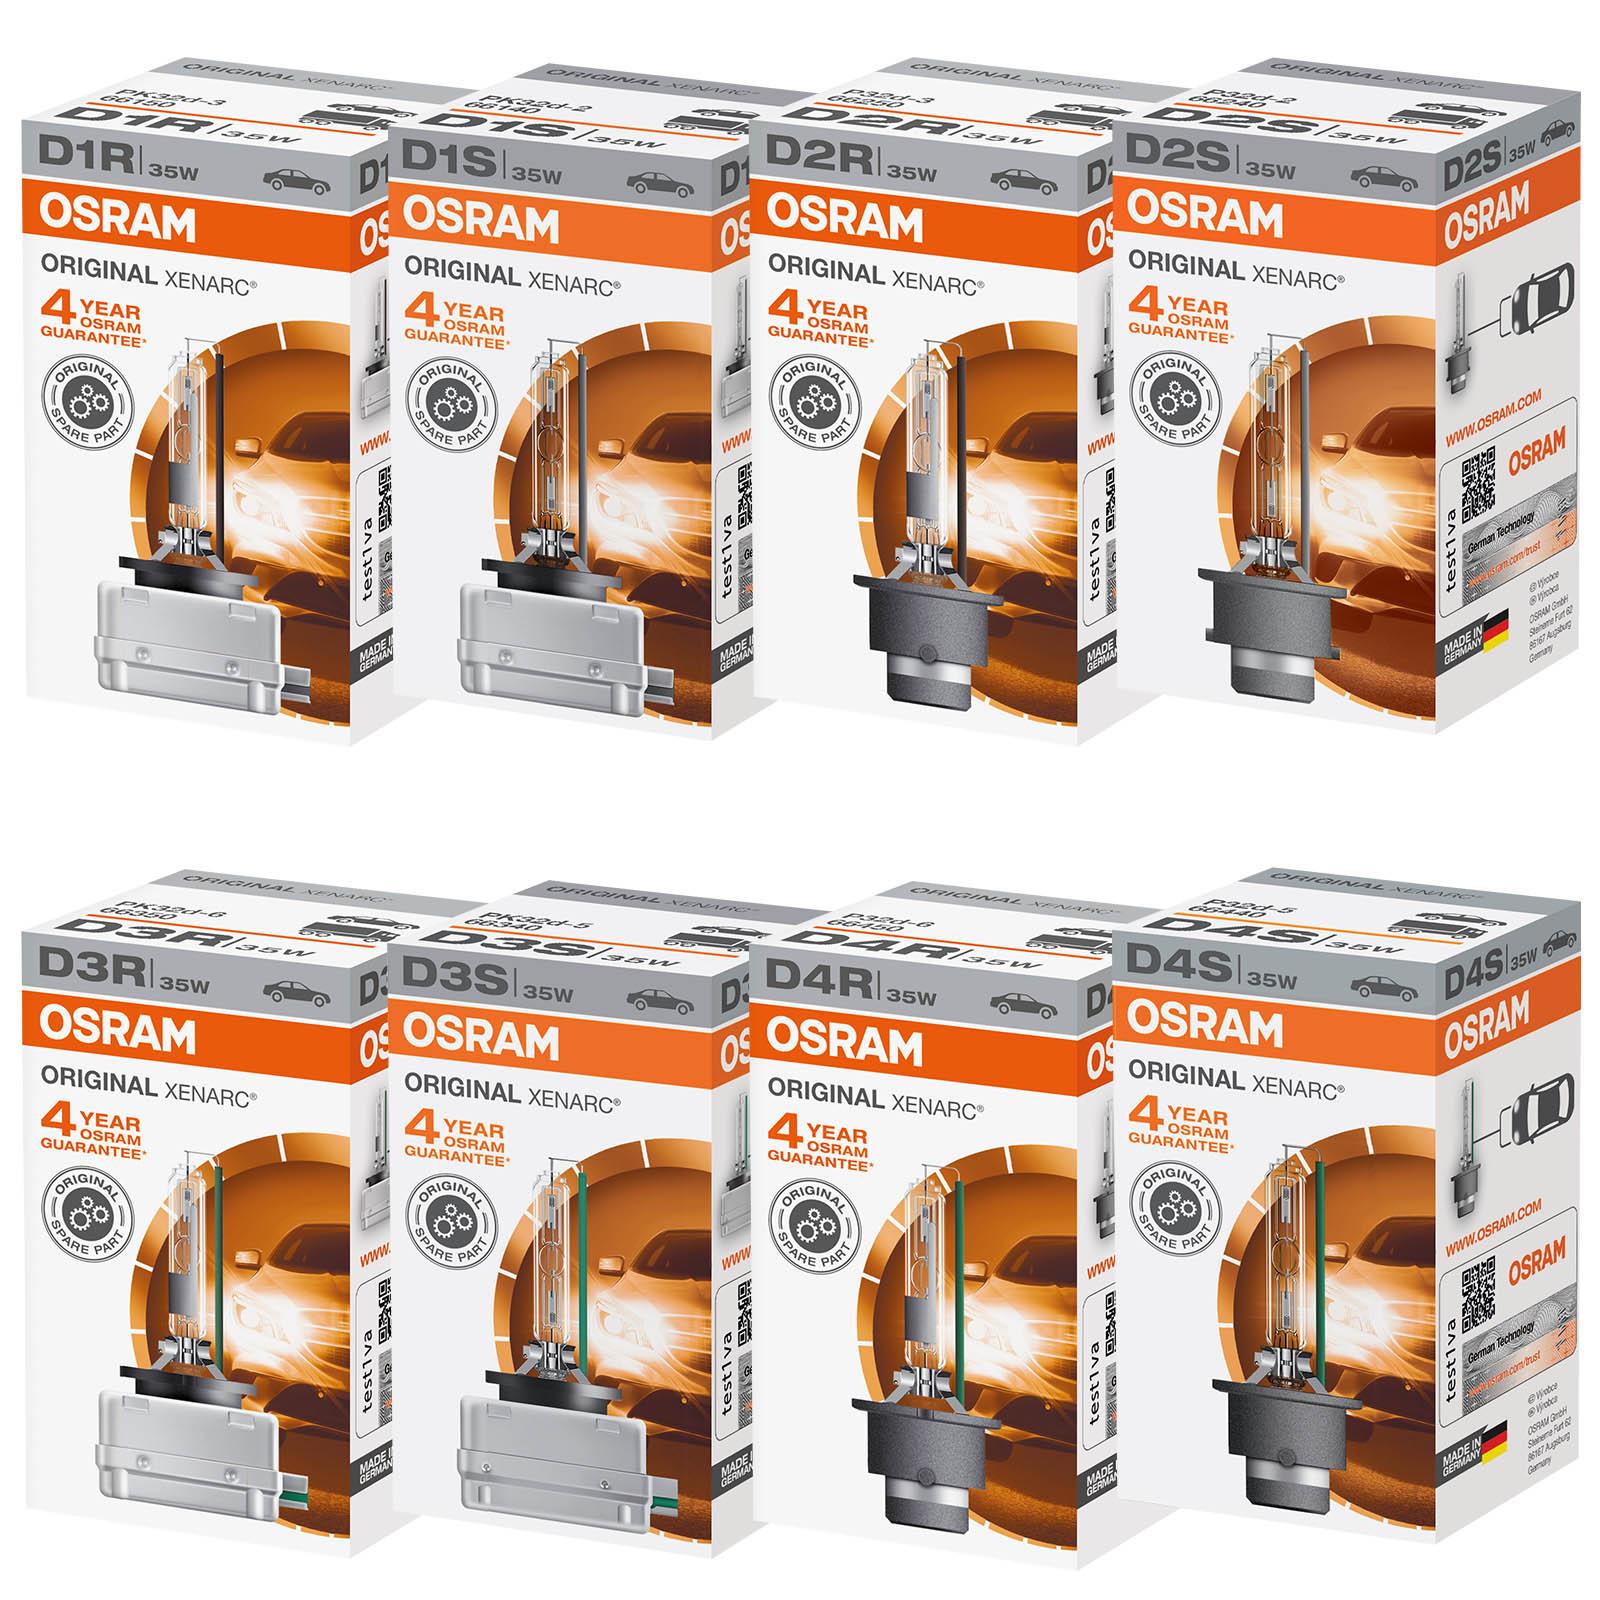 Osram Xenarc Original Line Standard Replacement HID Bulbs - All Fittings